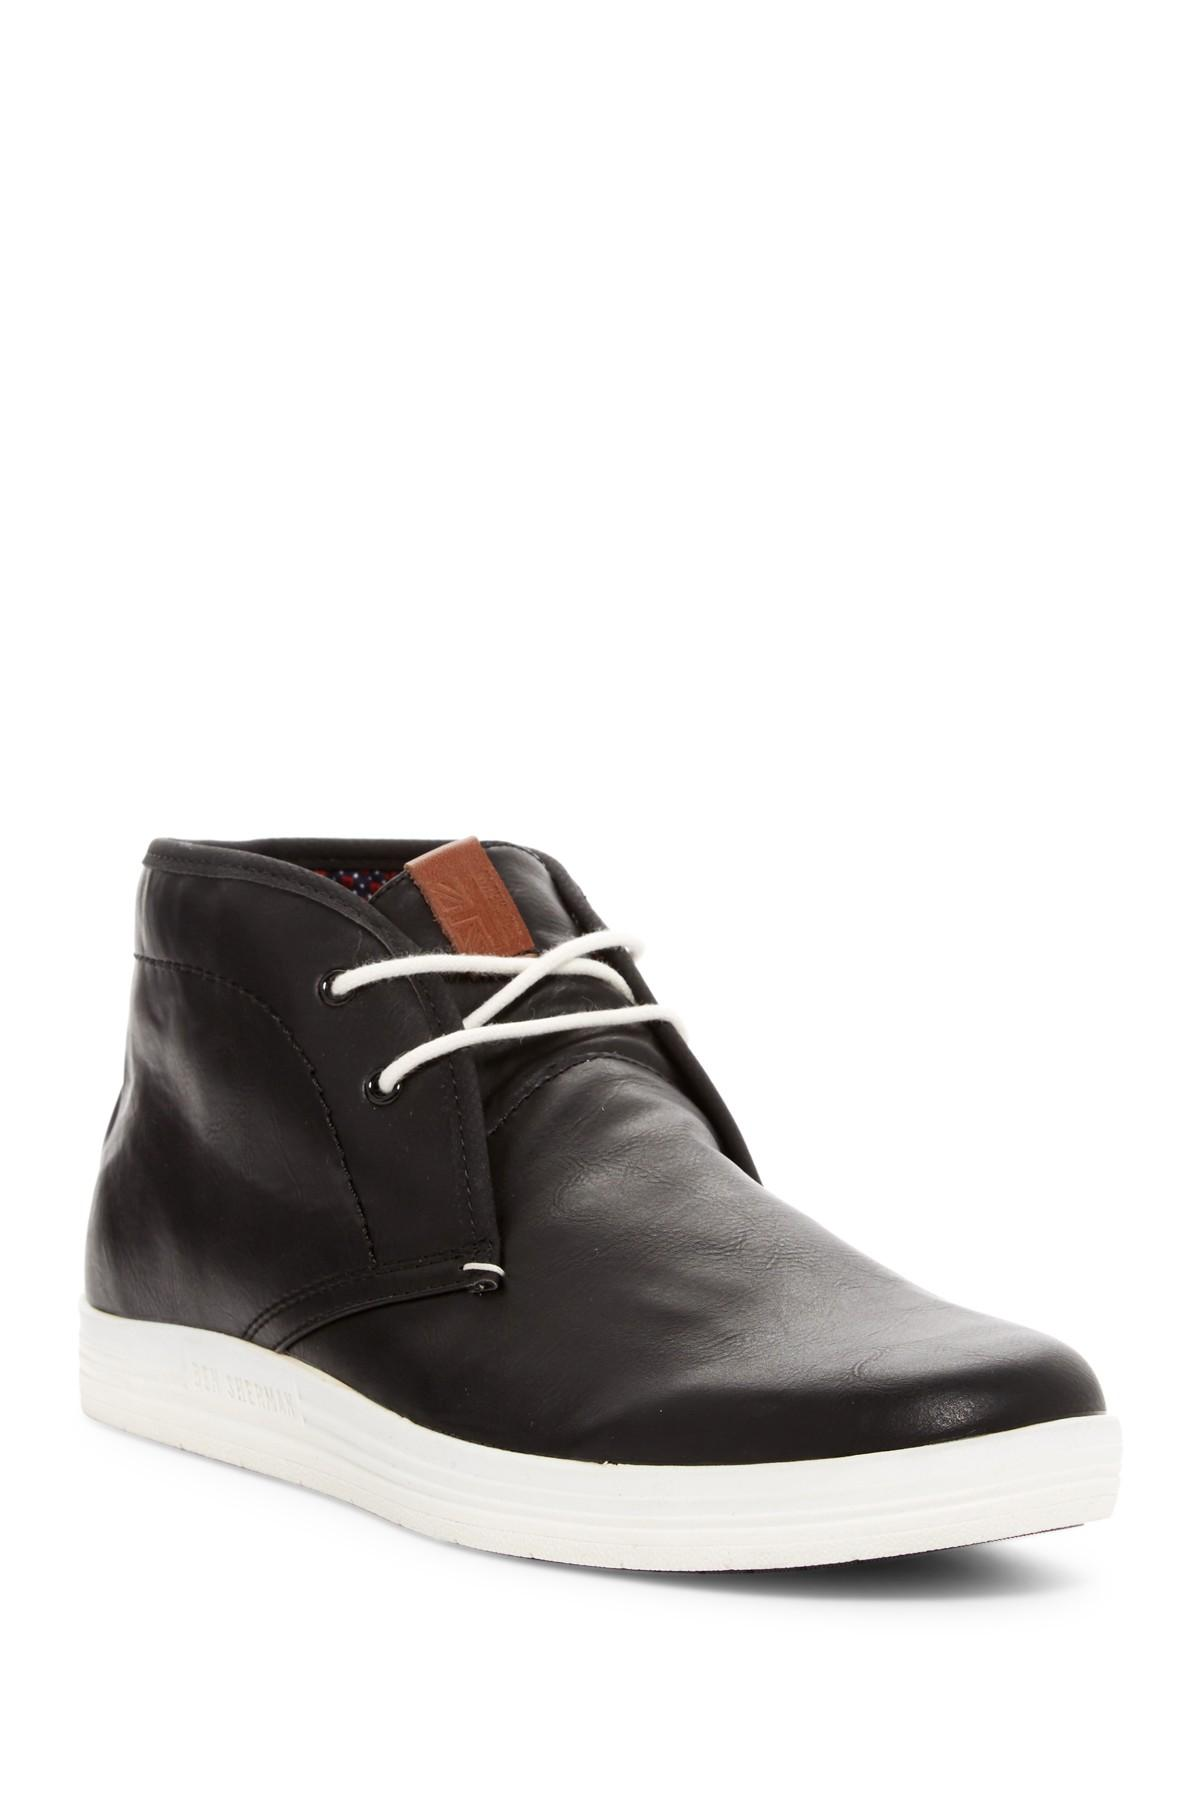 lyst ben sherman vaughn sneaker in black for men